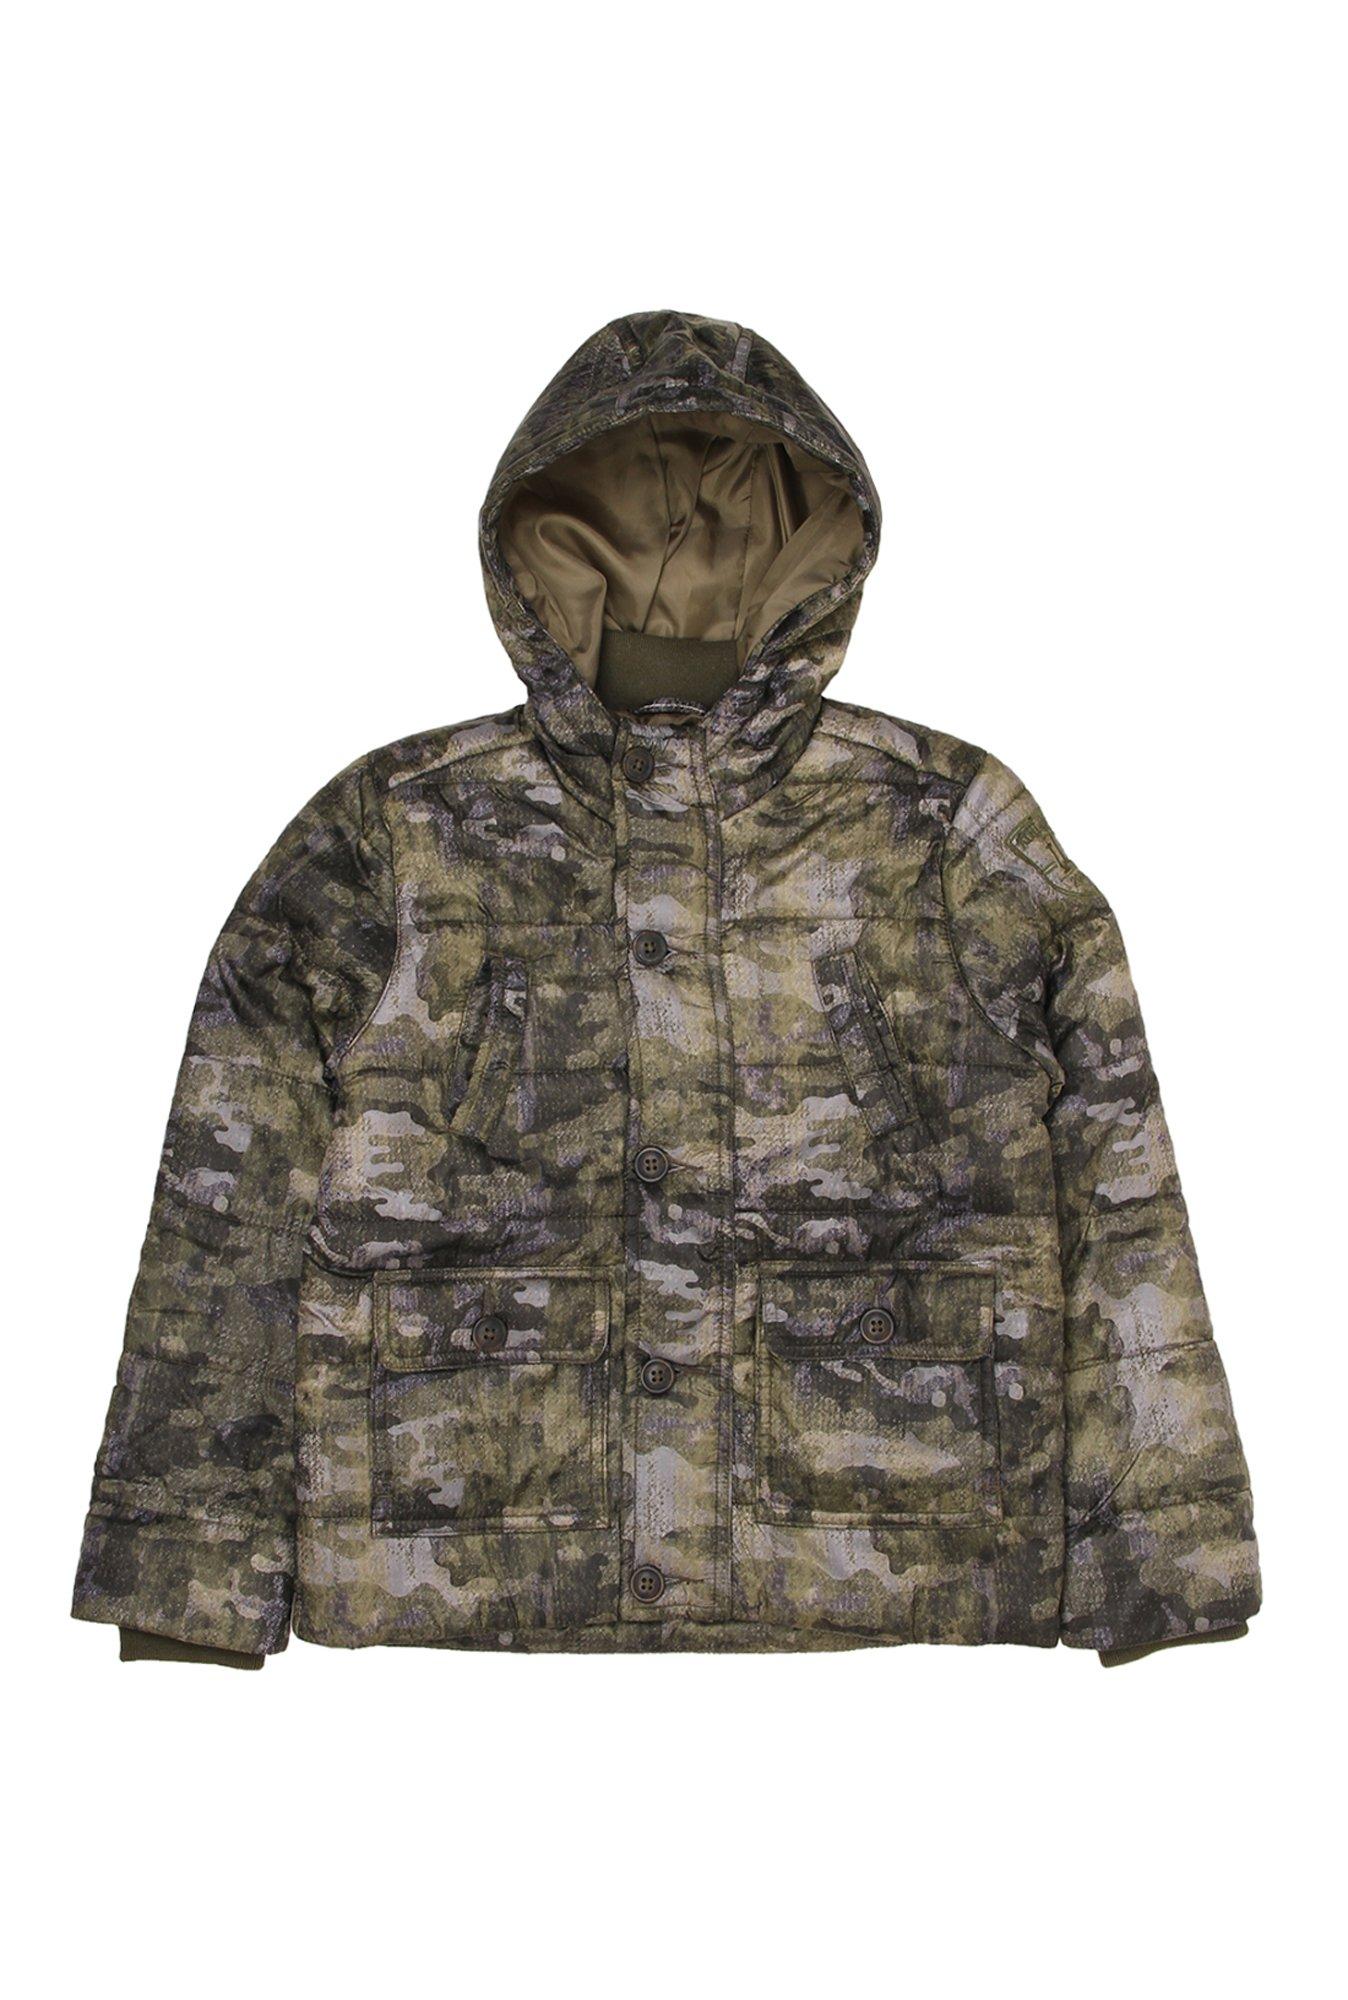 686305666516b Buy Indian Terrain Kids Olive Camouflage Hood Jacket for Boys Clothing  Online @ Tata CLiQ